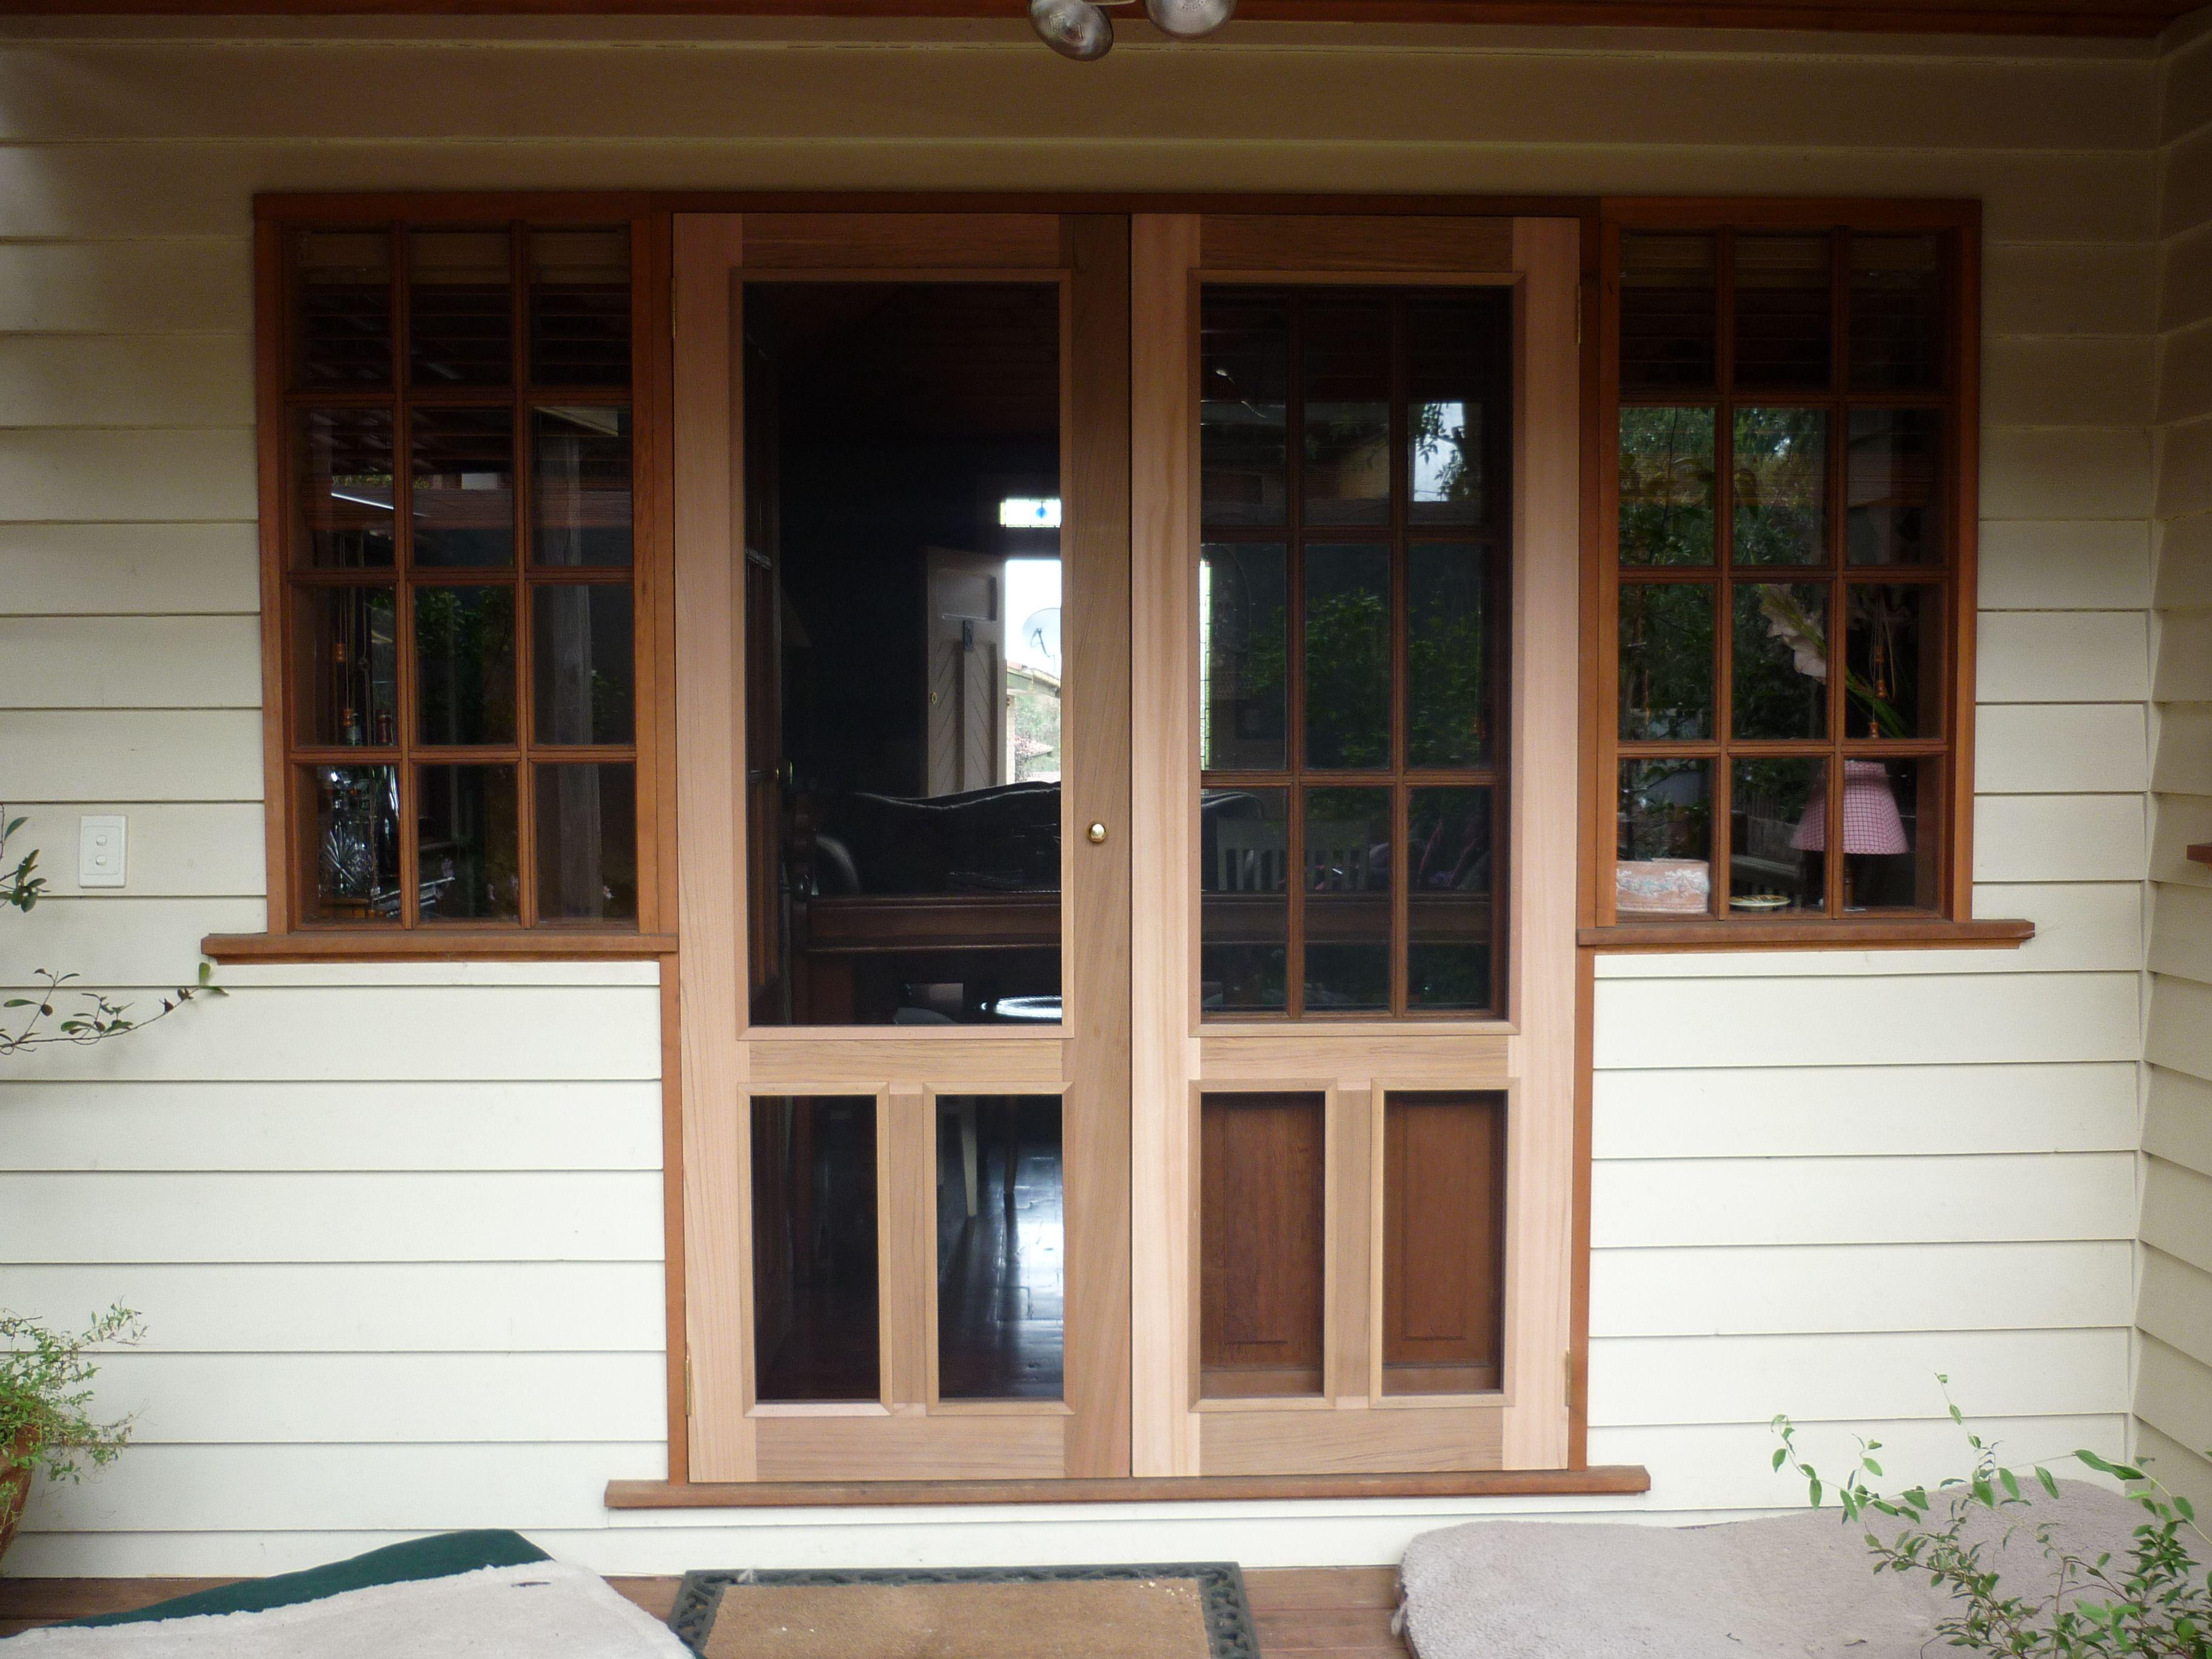 Fly Screen To Match French Doors Fly Screen Doors French Door